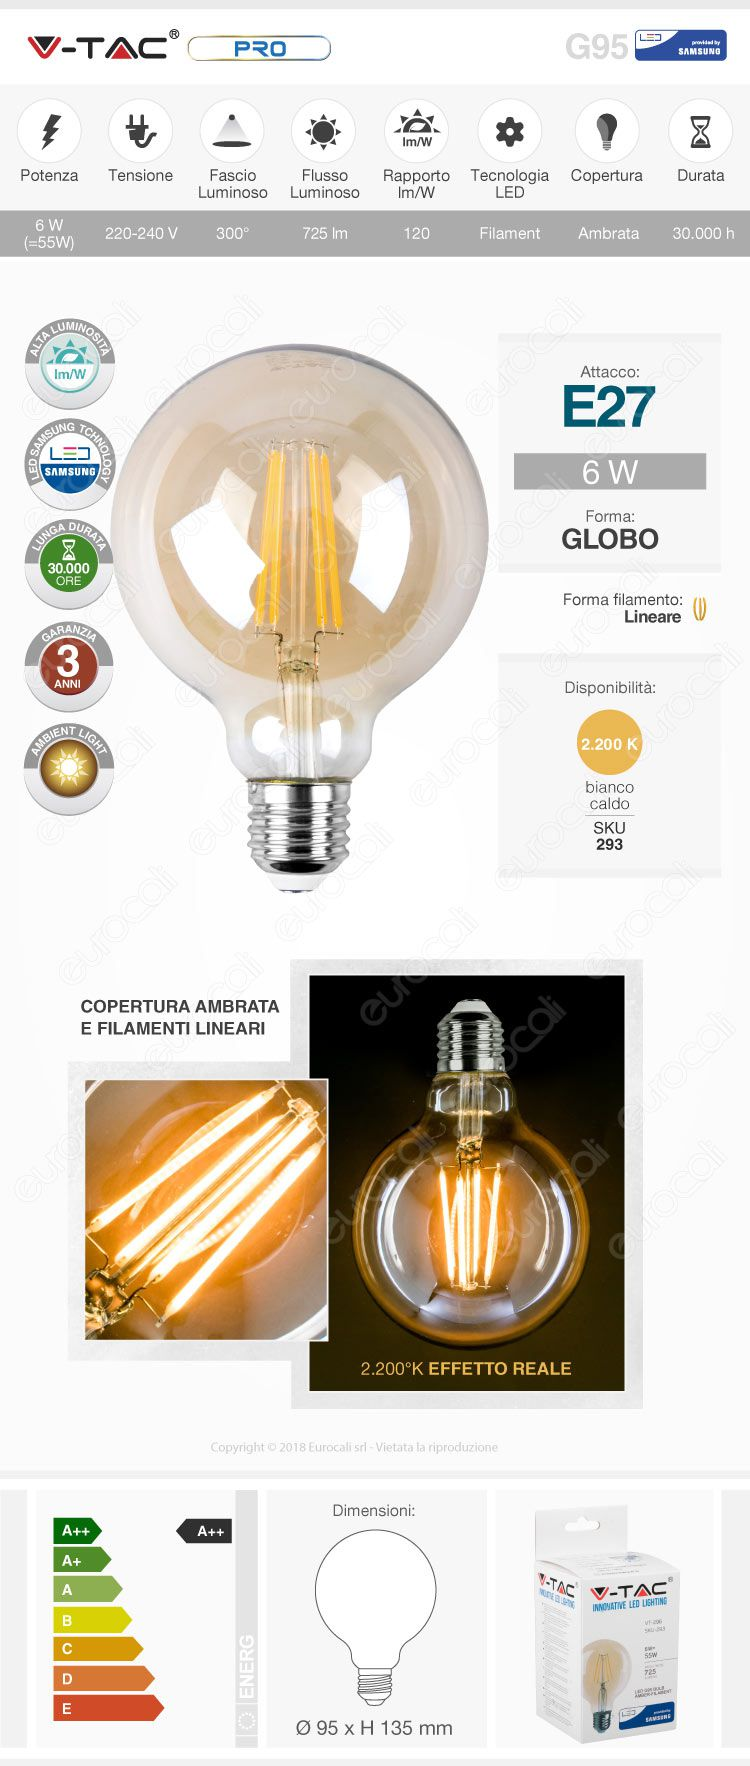 V-Tac VT-296 Lampadina LED E27 6W Globo G95 Chip Samsung Filamento Ambrata - SKU 293